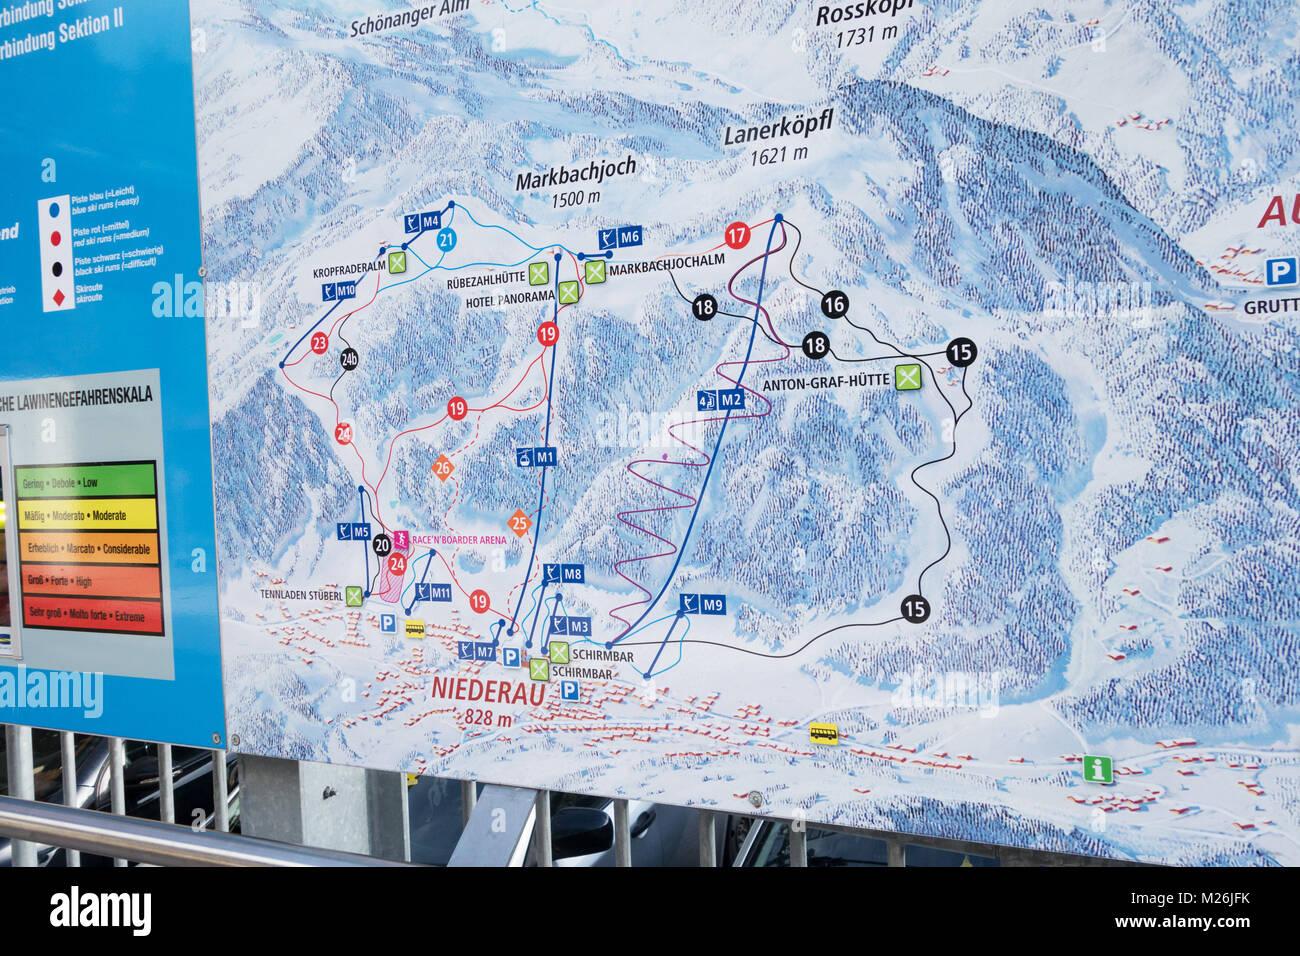 Skiing piste map, Niederau village, Alpenbach, Tirol, Austria Europe - Stock Image